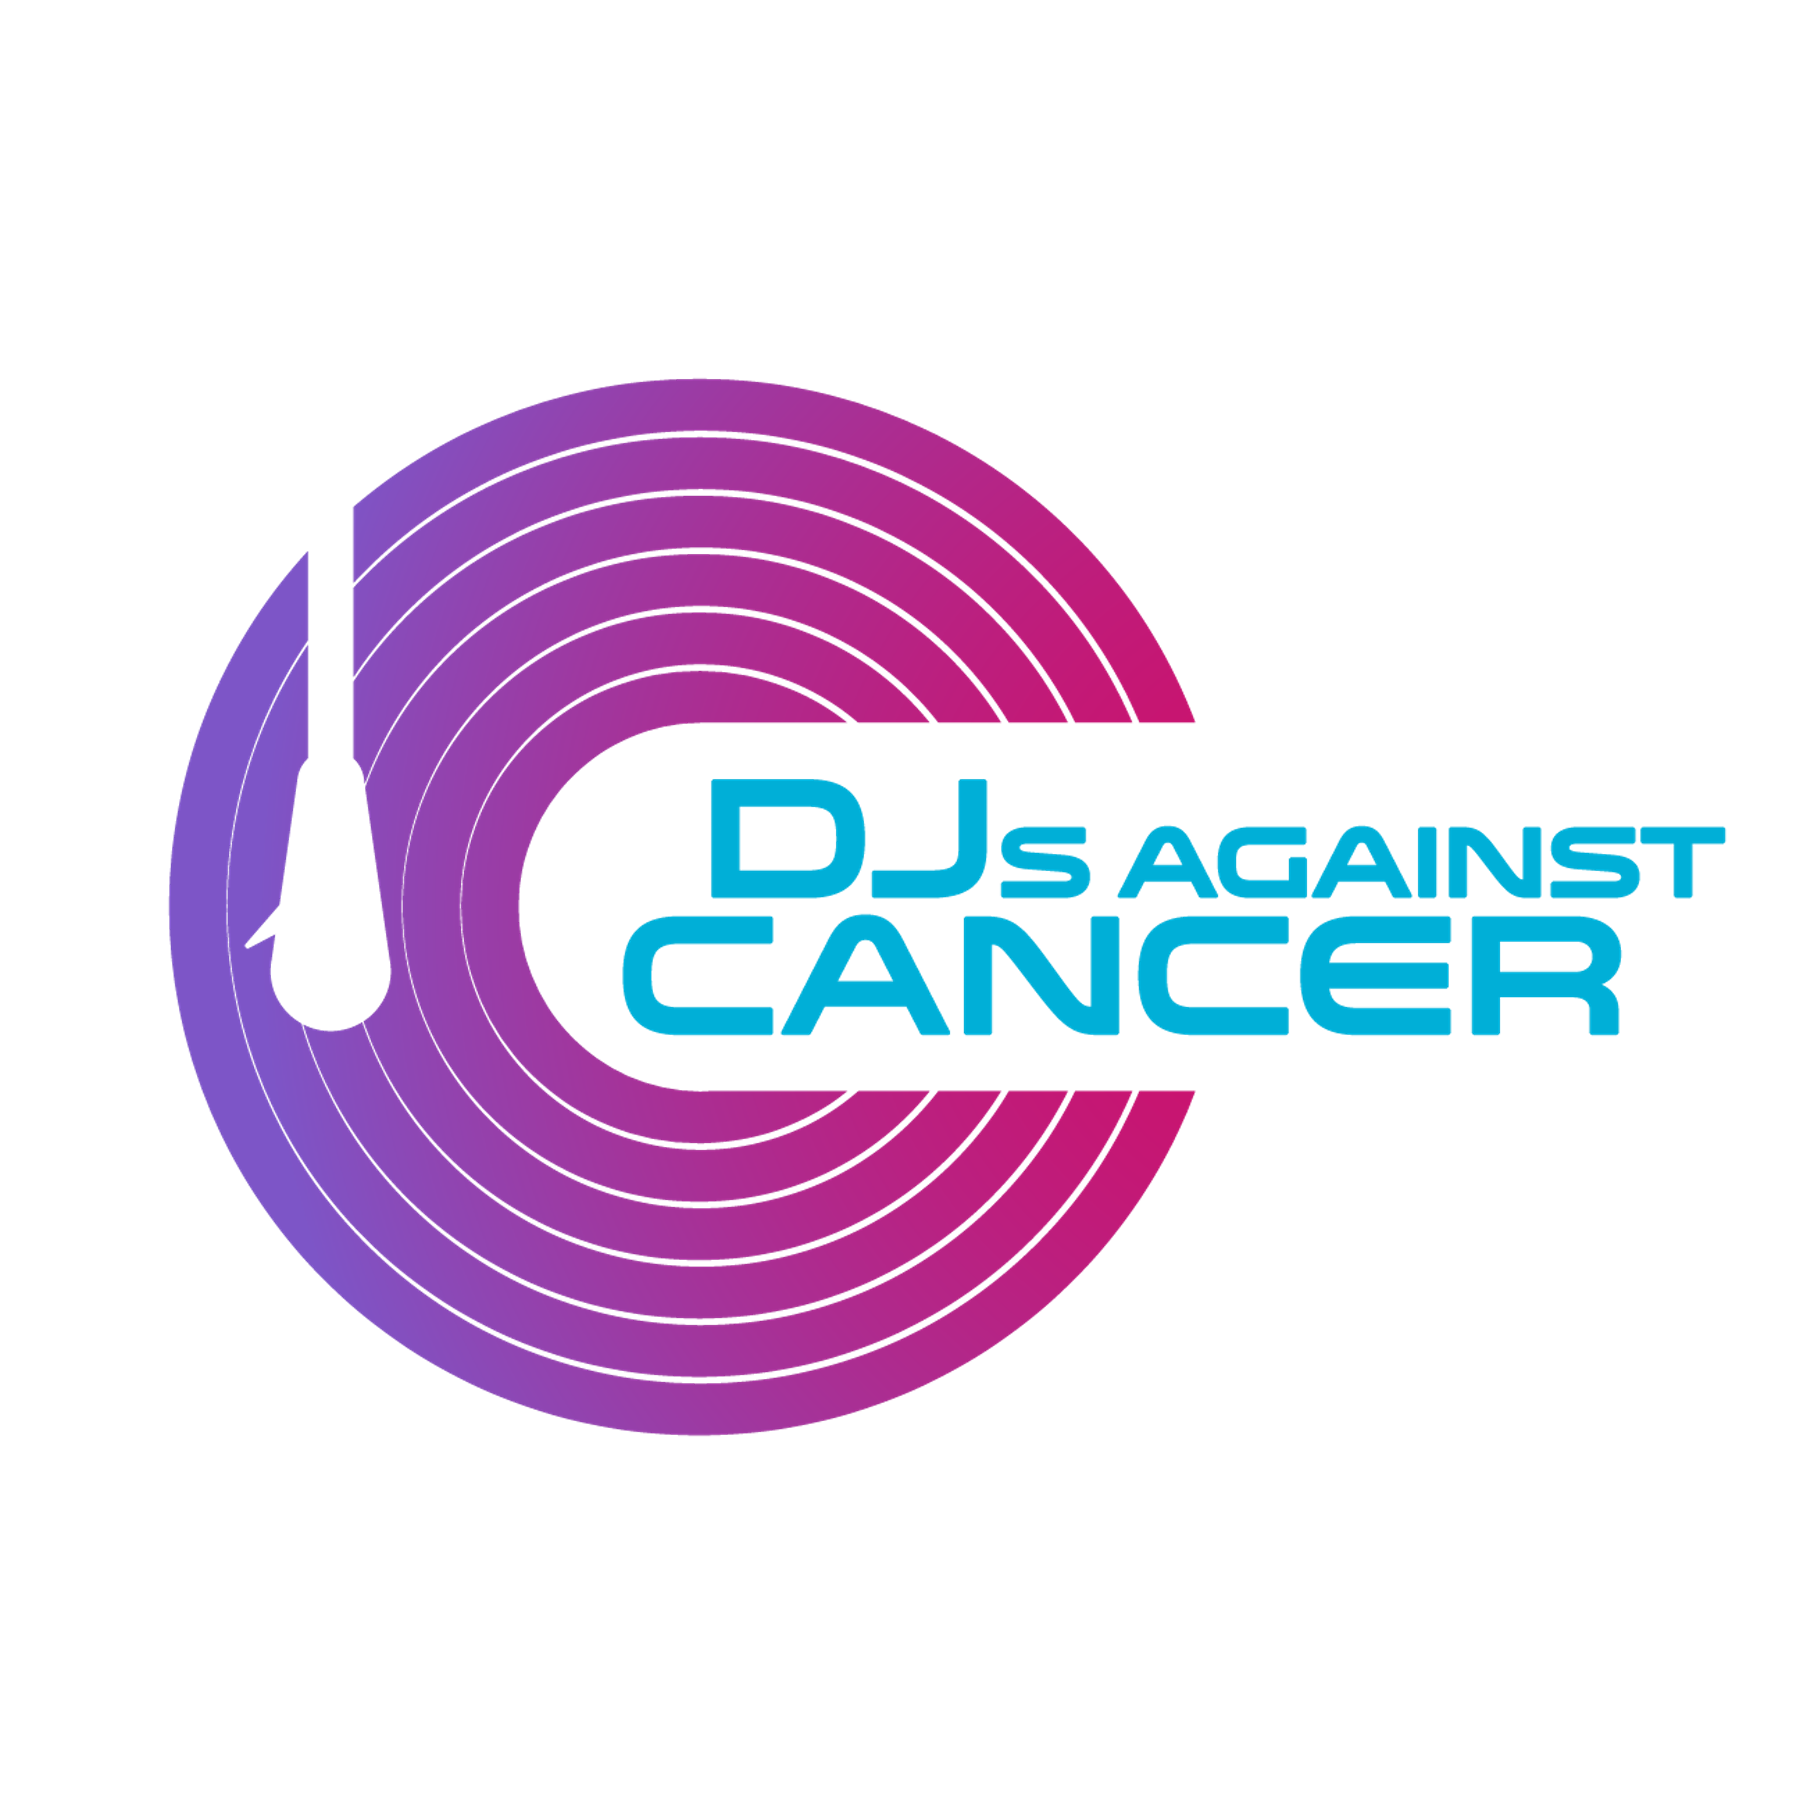 DJsAgainstCancer-RGB.png